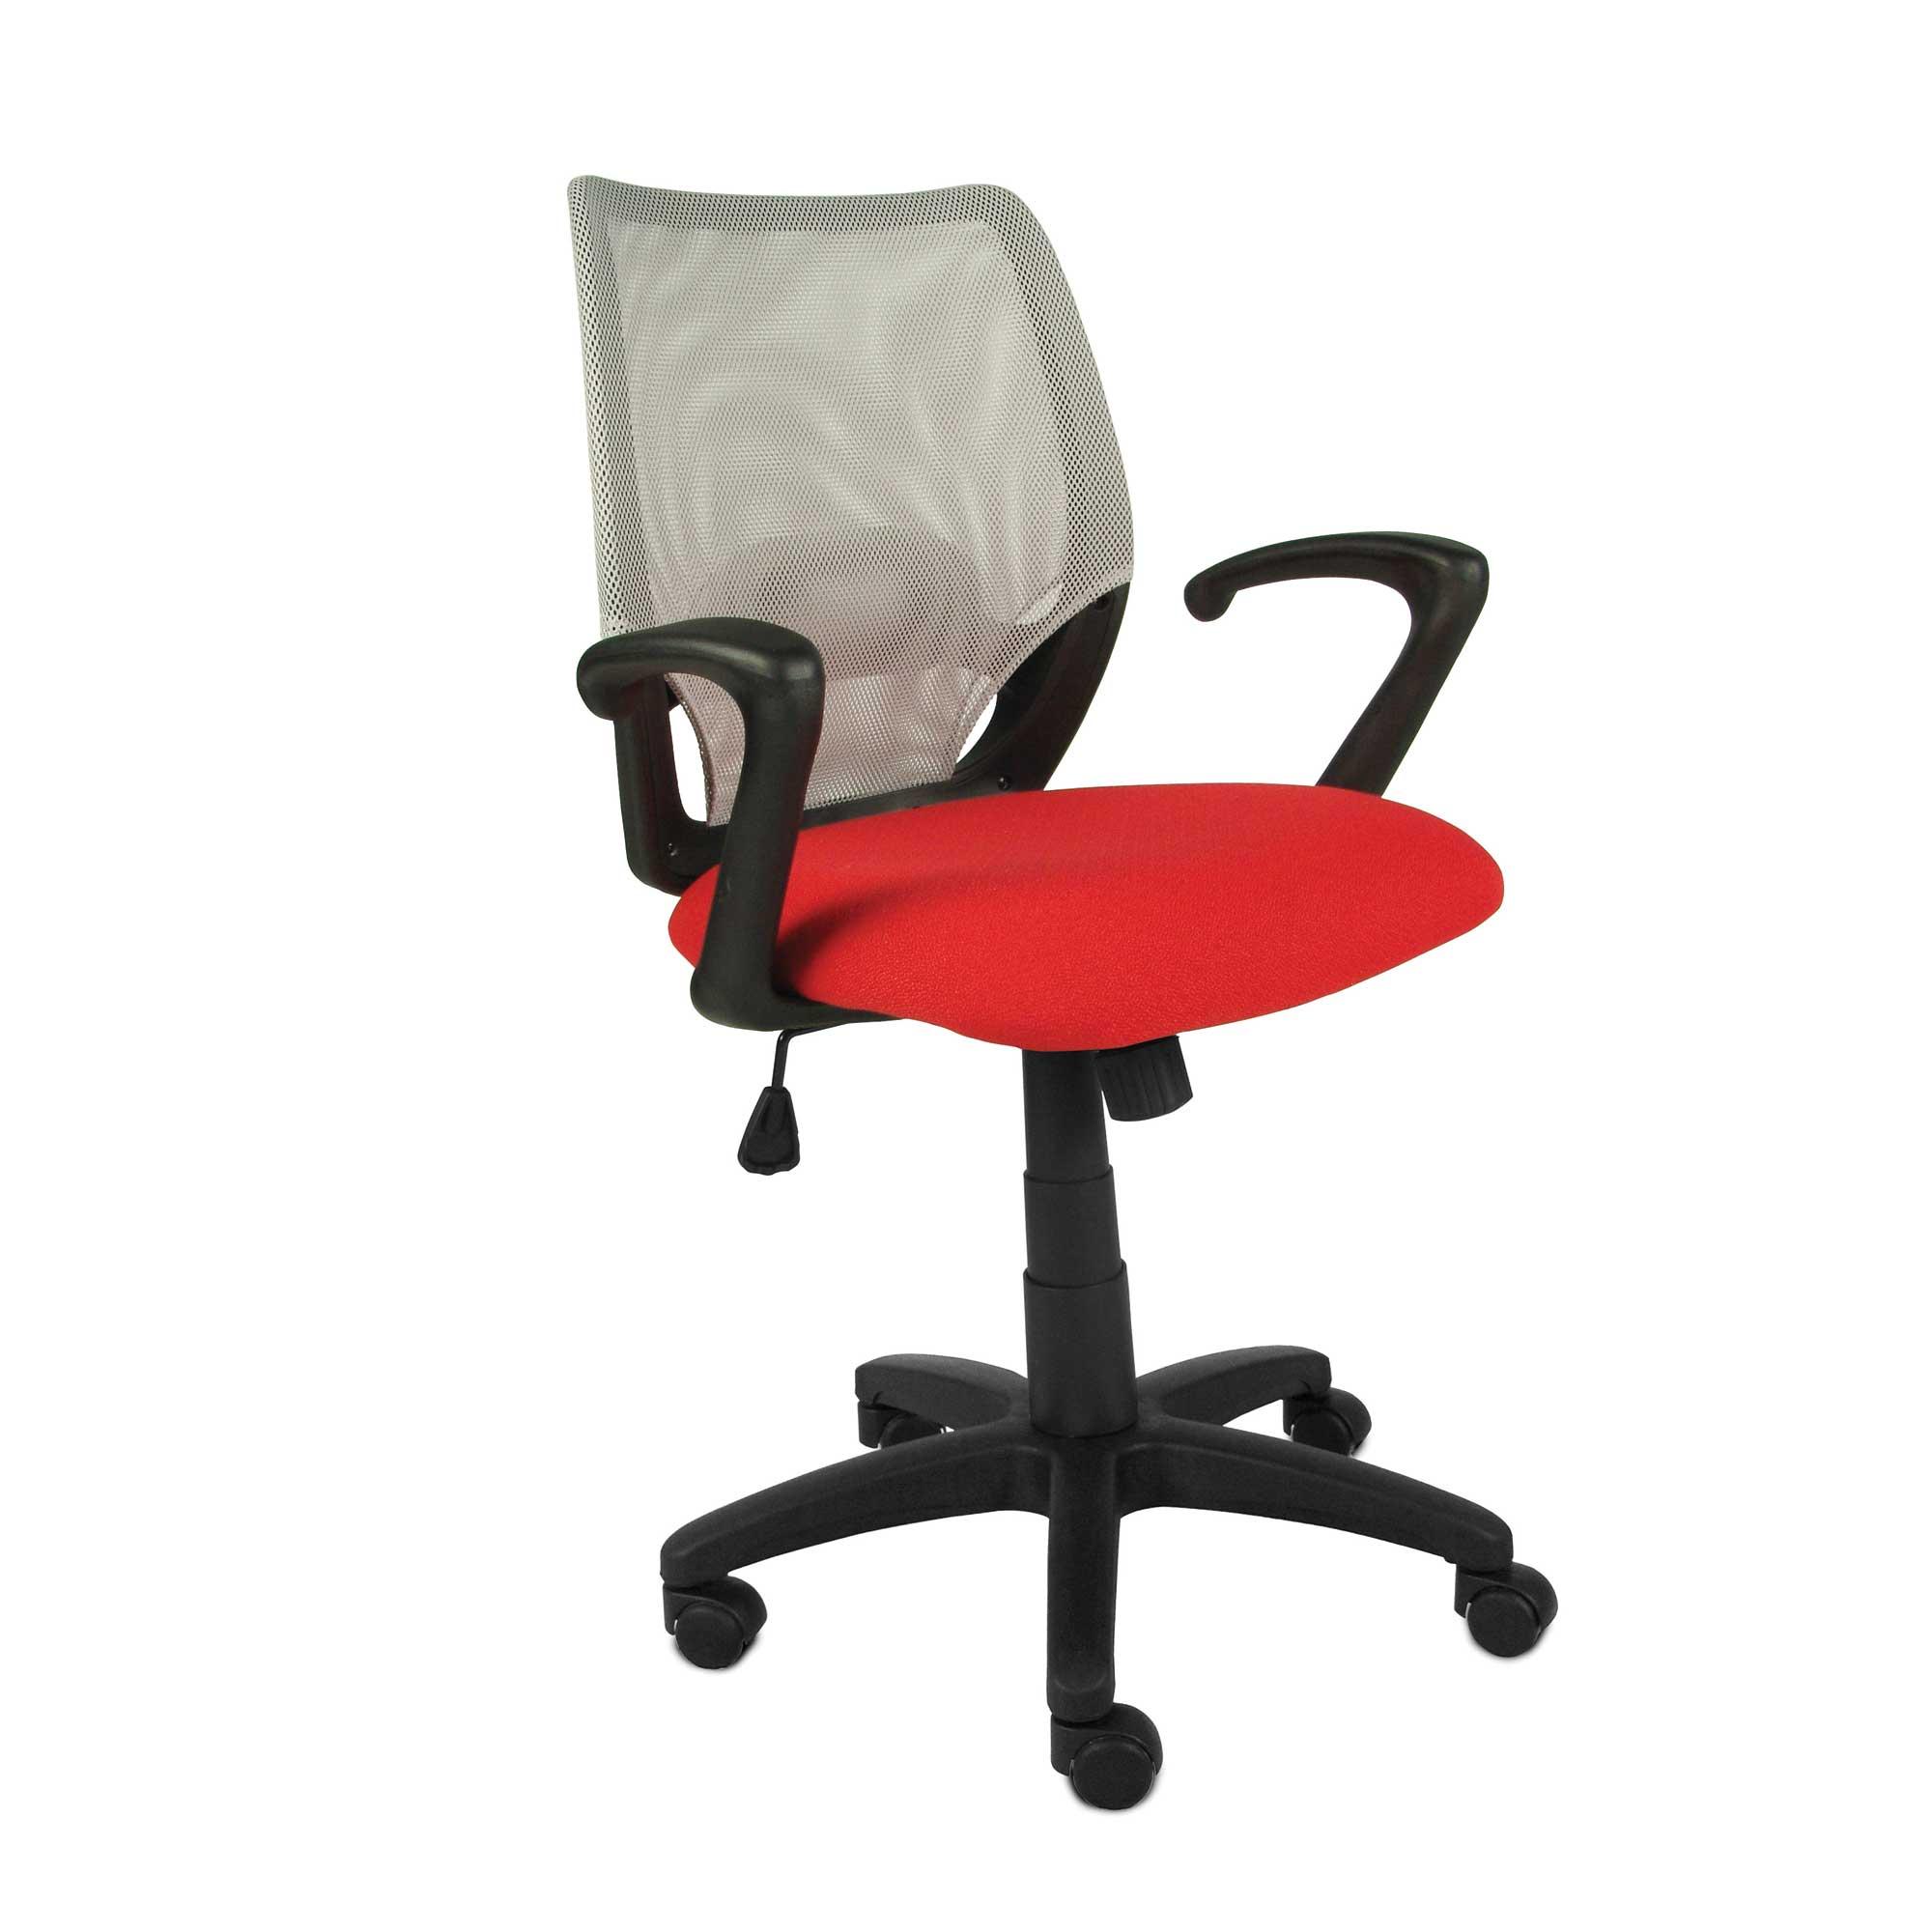 Silla operativa chat color grupo meta soluciones de for Sillas ejecutivas para oficina